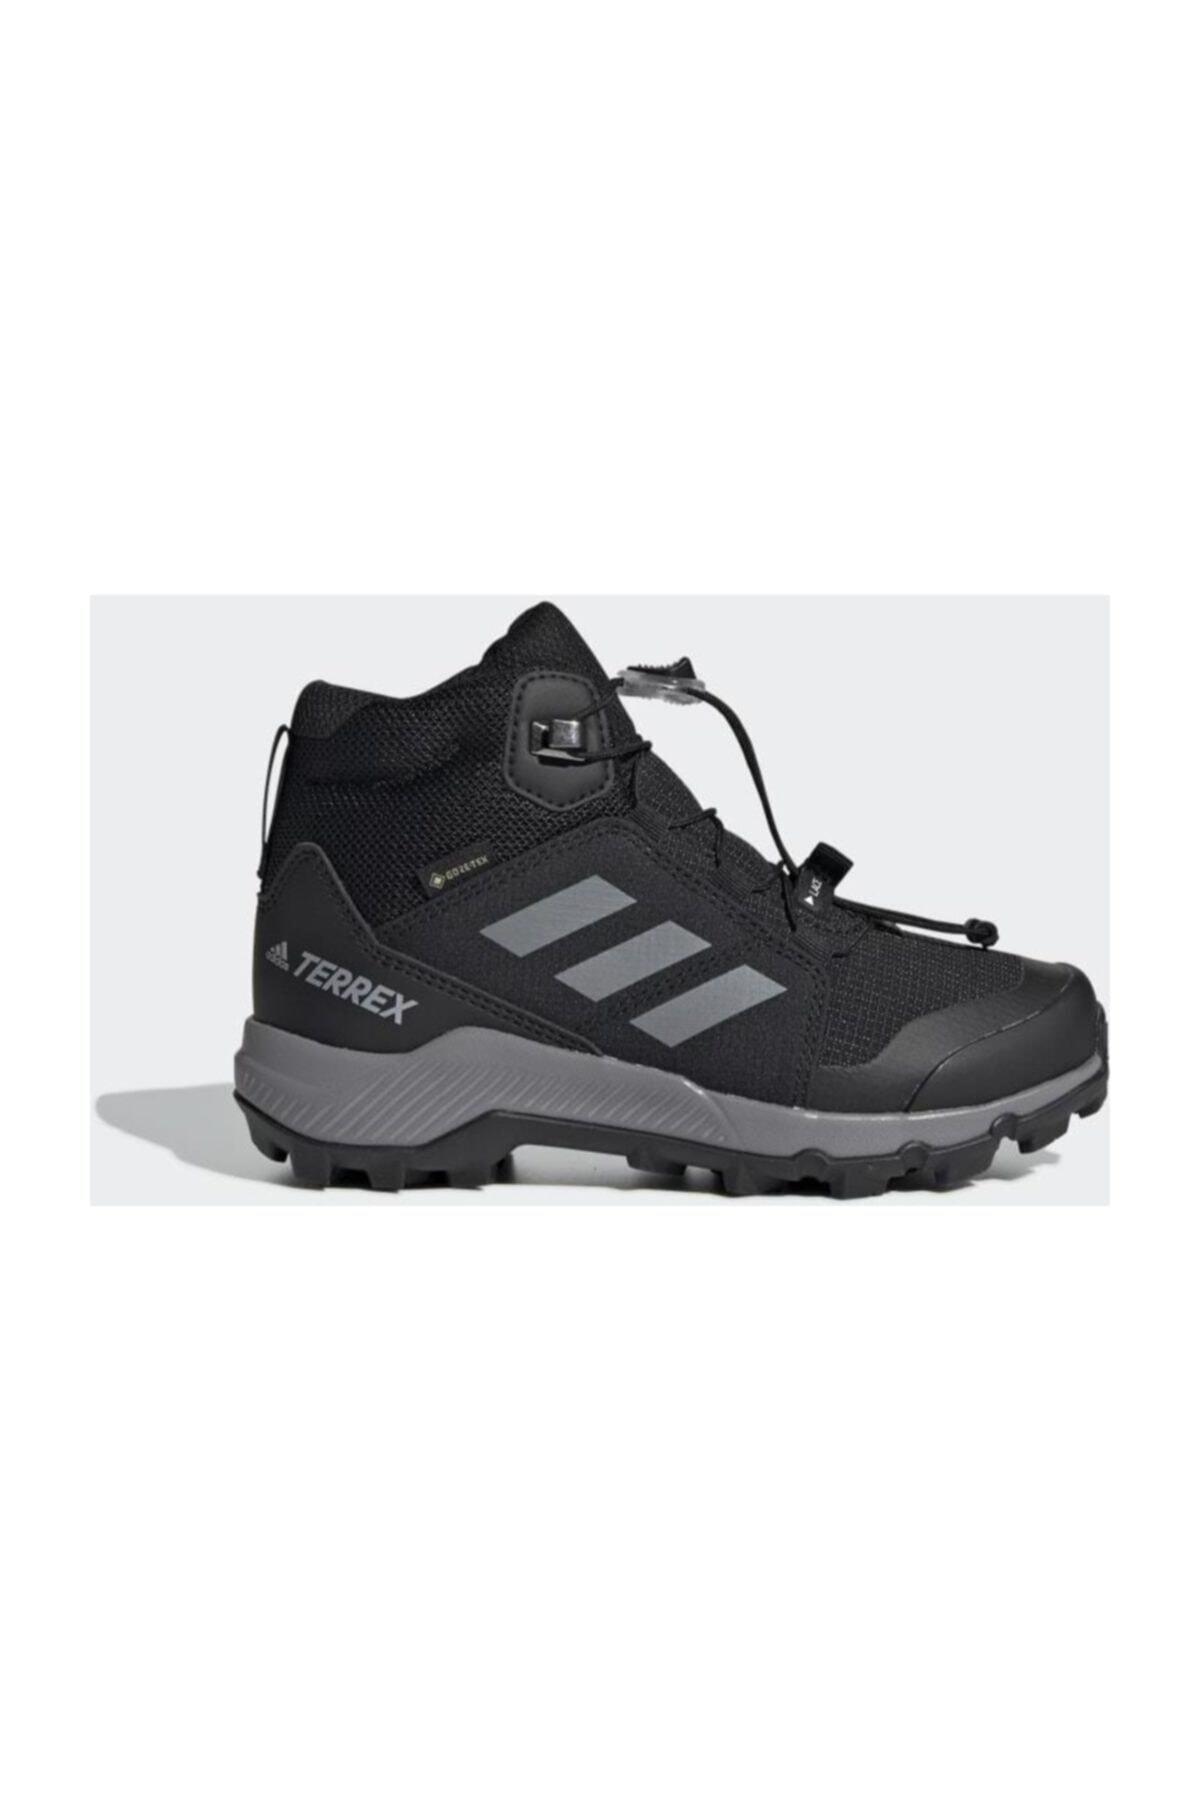 adidas TERREX MID GTX K Siyah Kız Çocuk Outdoor Ayakkabı 100663734 1